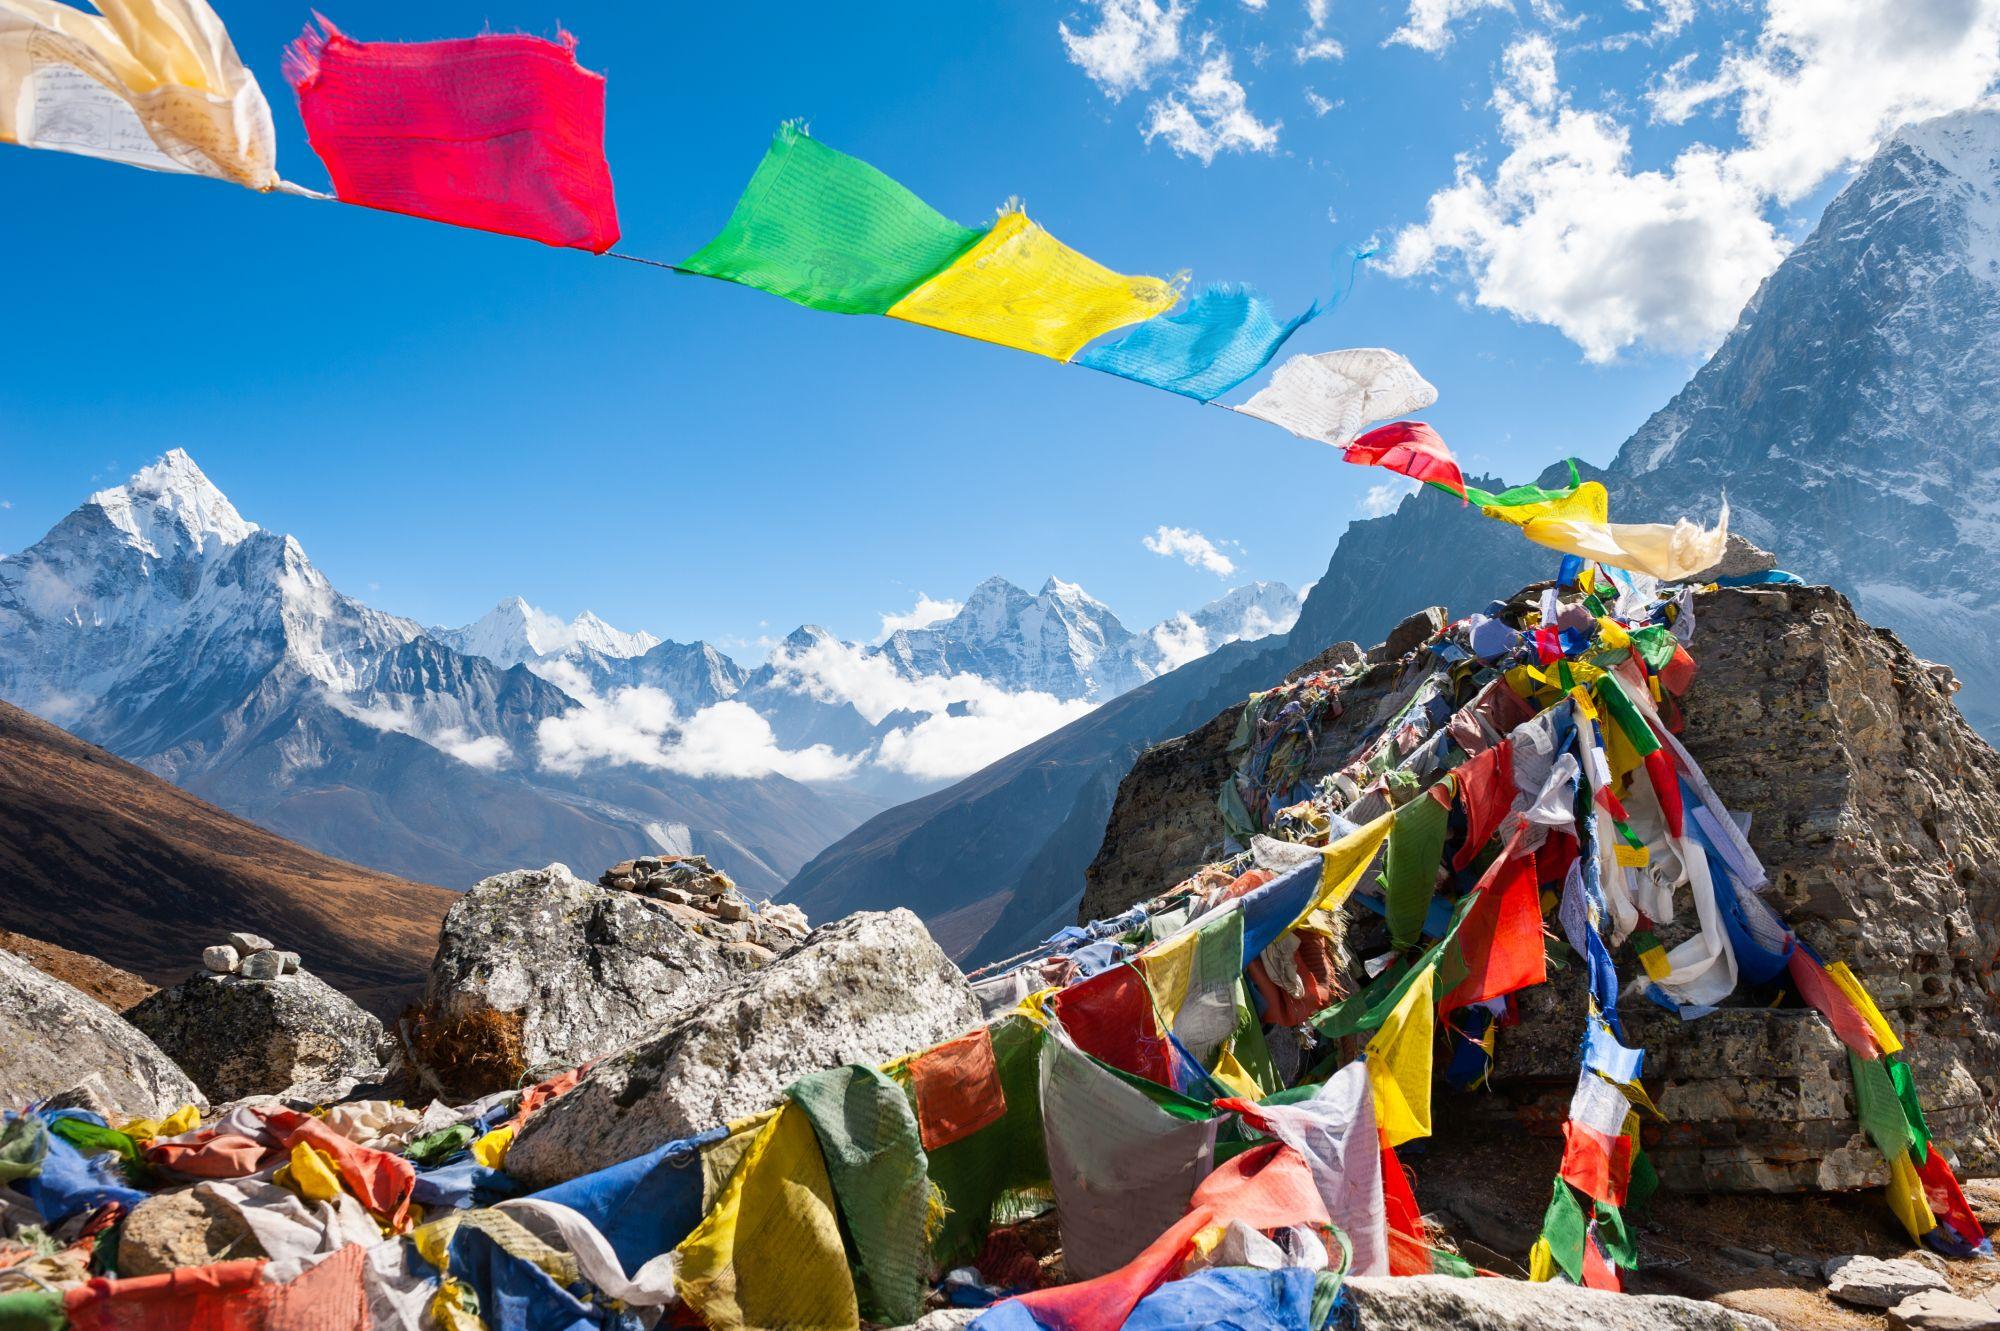 Nepal Himalayas Base Camp Mount Everest gebedsvlaggetjes